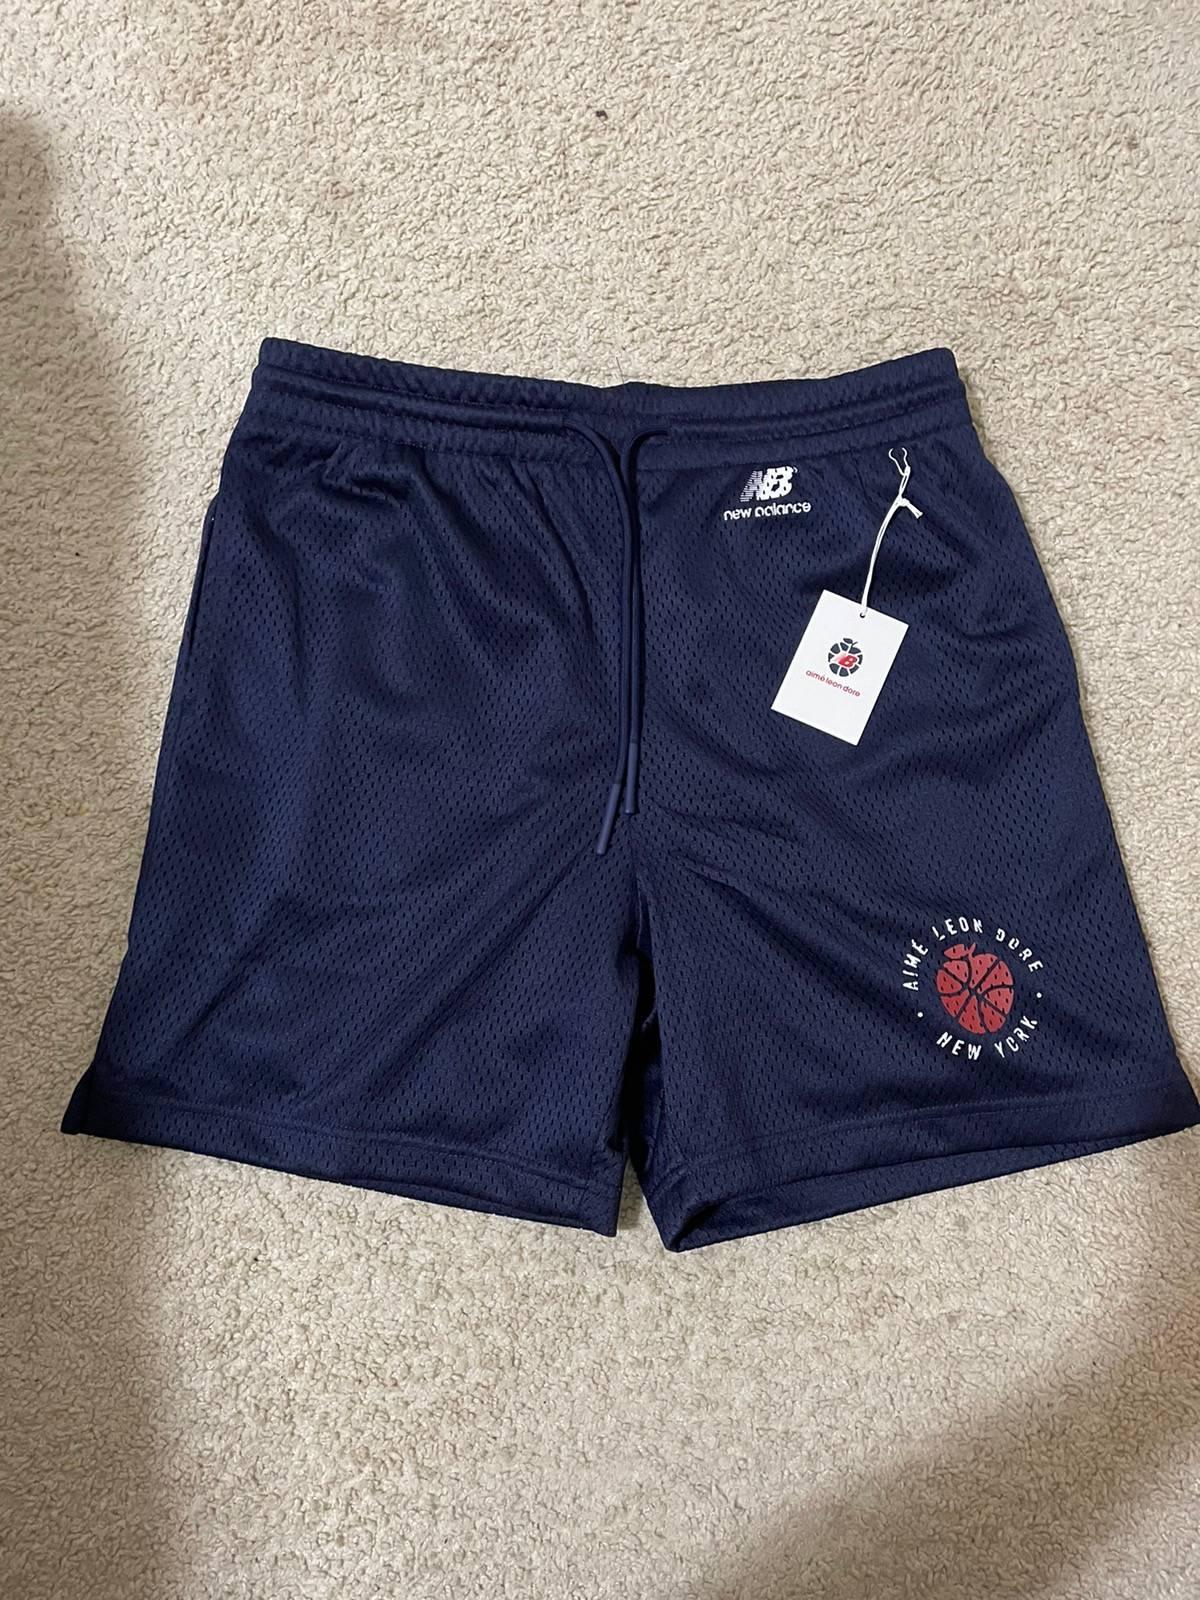 new balance gym shorts